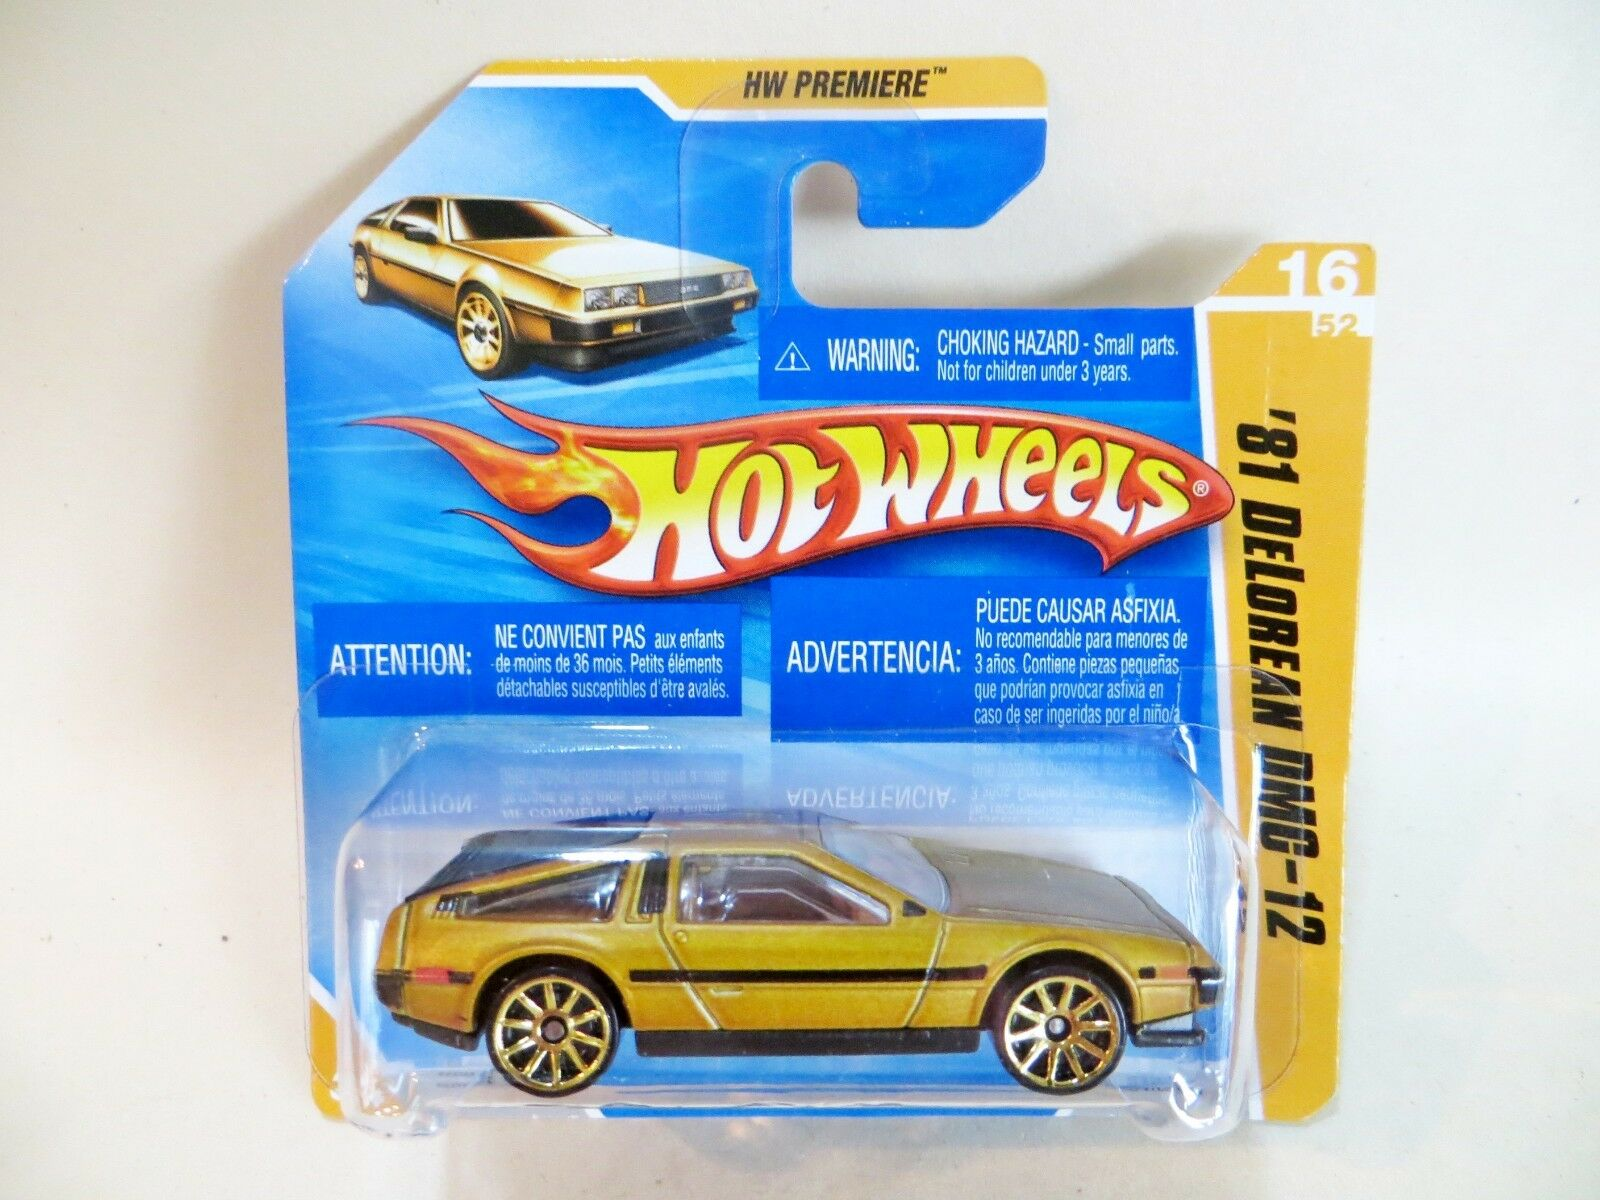 Hotwheels'81 DeLorean DMC-12' Dorado. Hw Premiere MIB Blister Blister Blister tarjeta Corta Cardada . cbe760